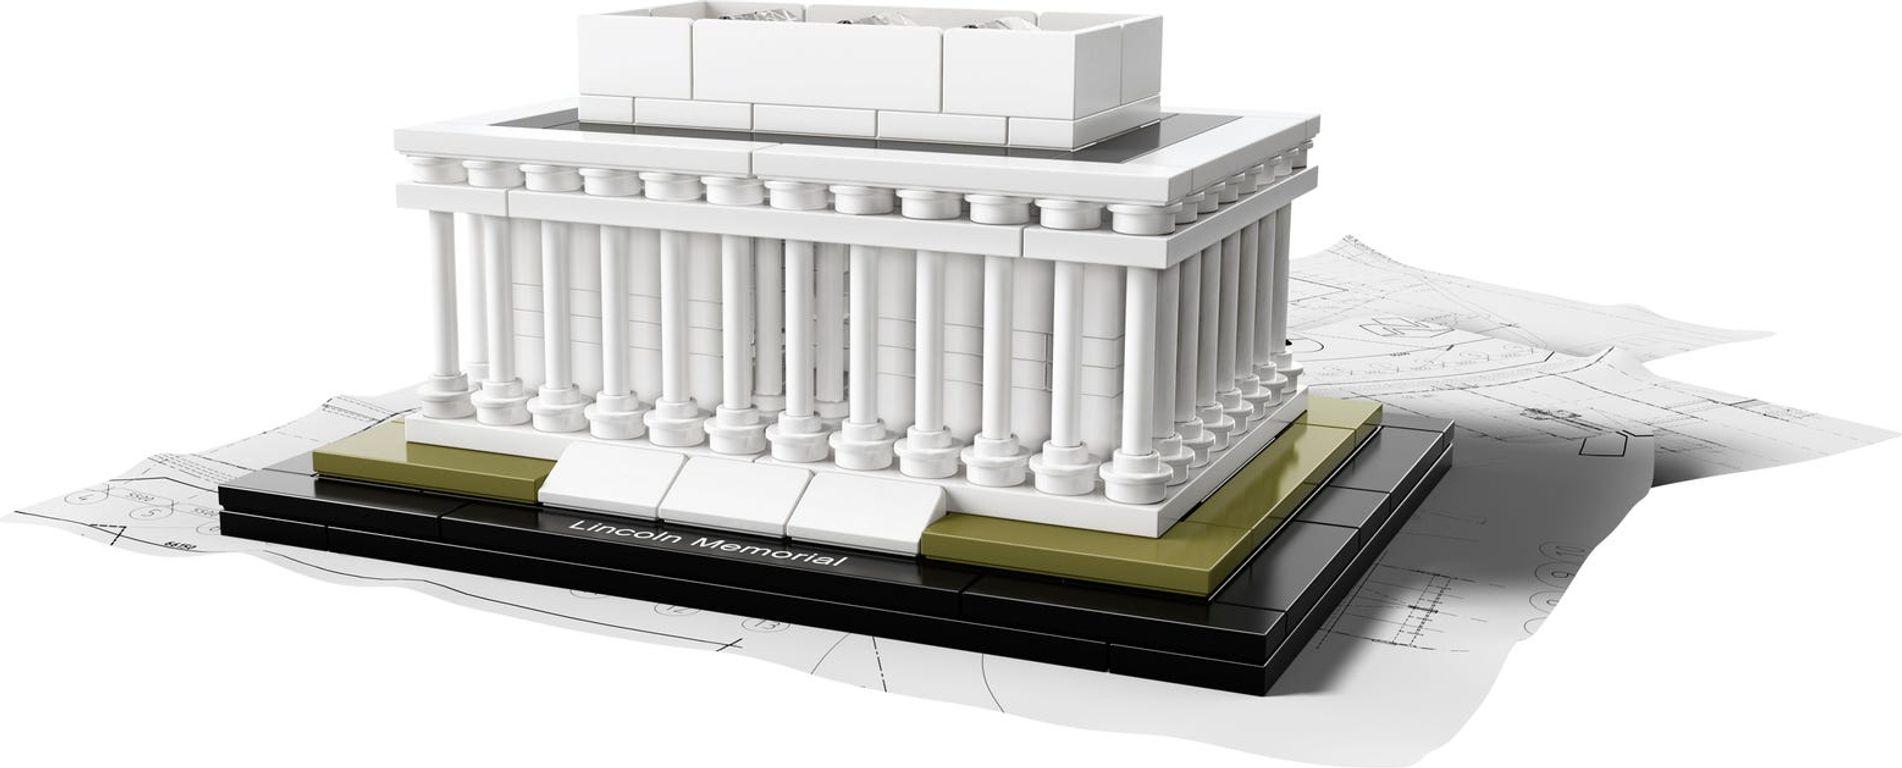 Lincoln Memorial components